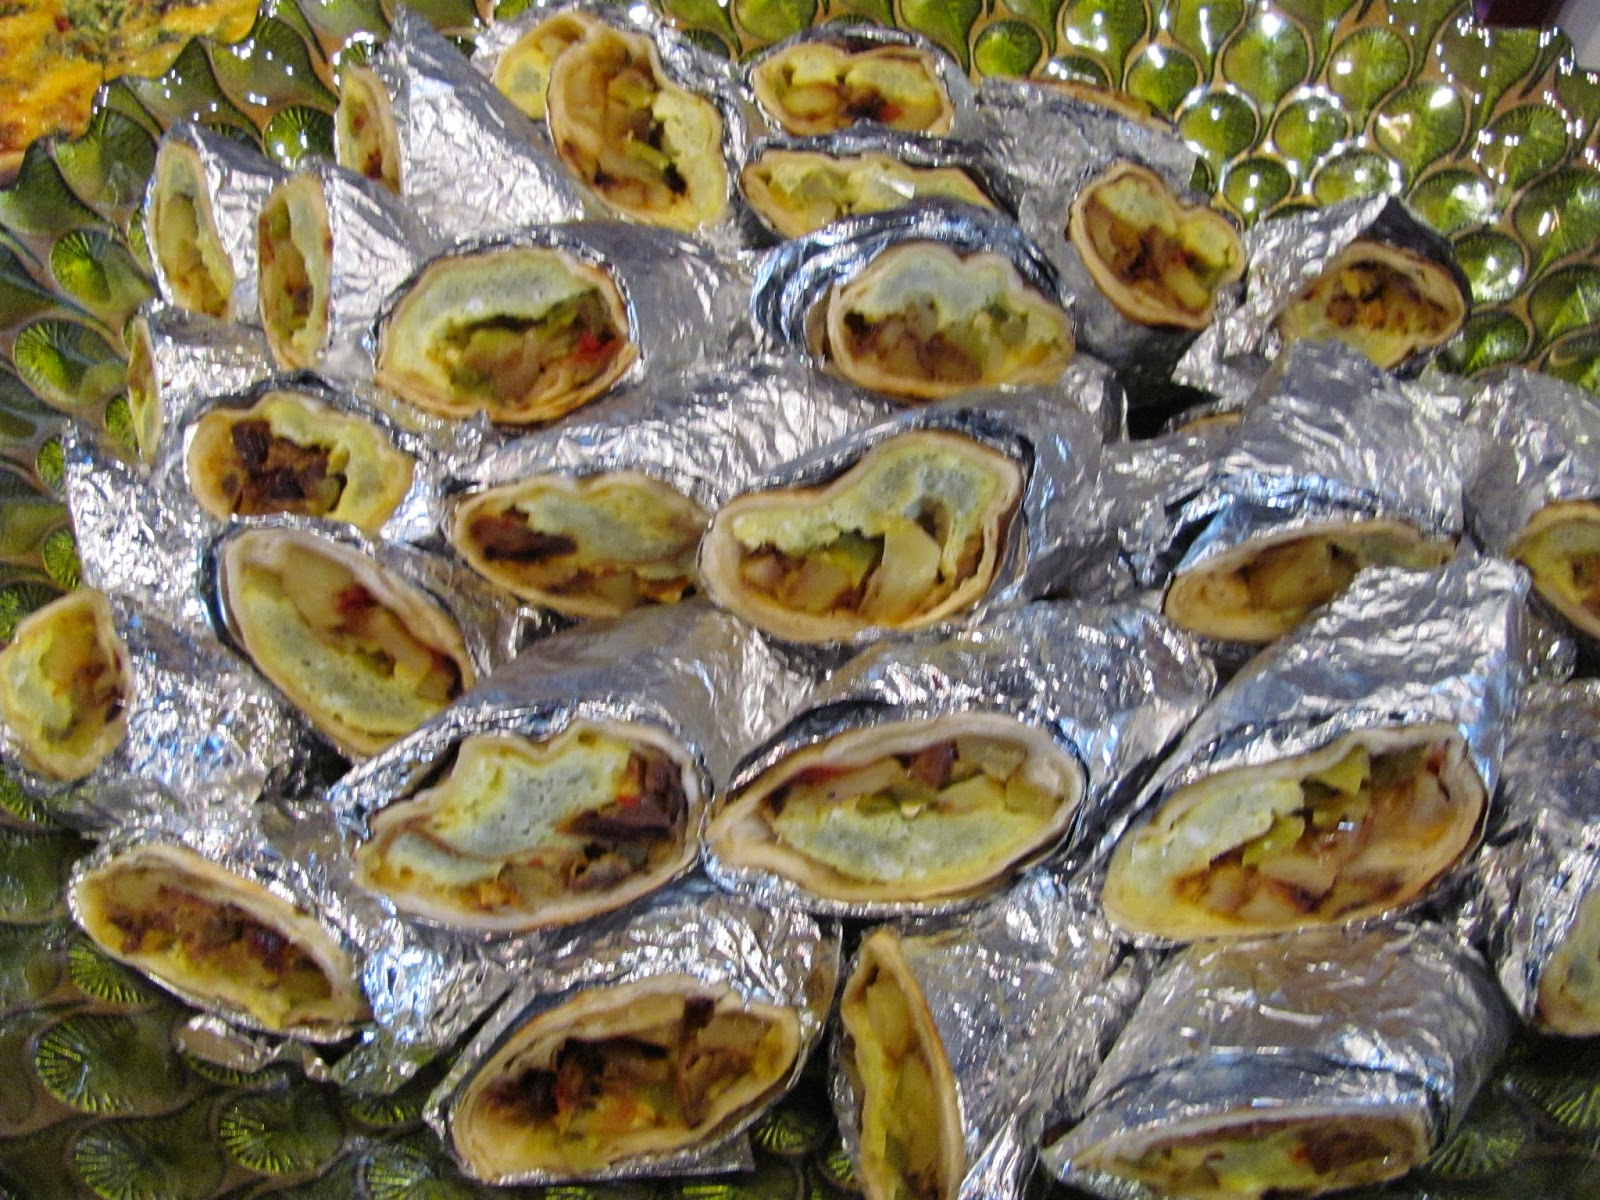 Mini Breakfast Burrito Platter: organic eggs, tillamook cheddar, green chile, and southwest potatoes